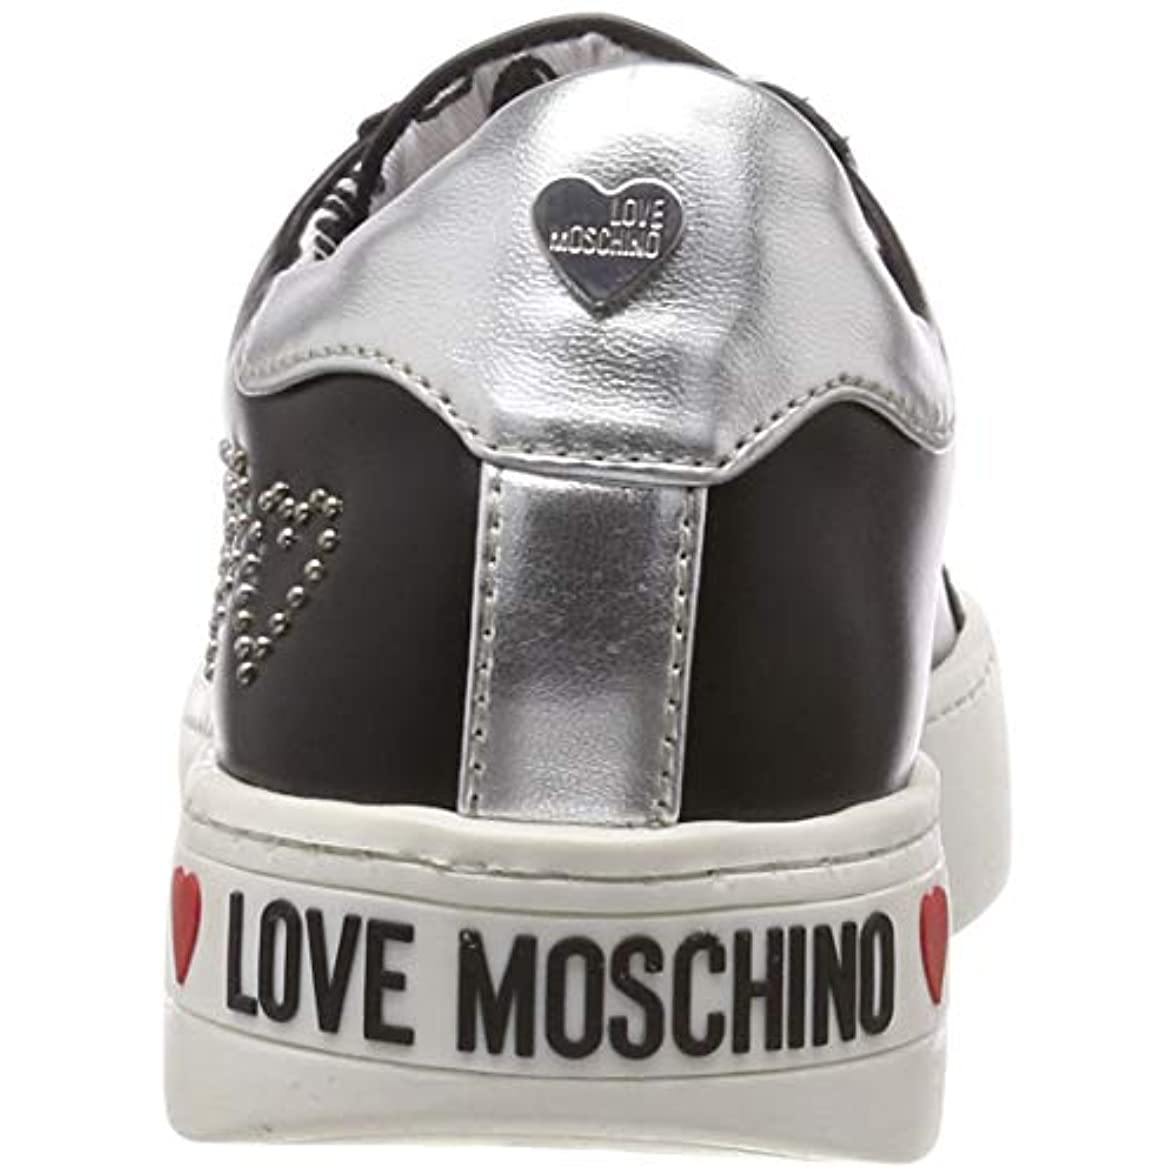 Sneaker Moschino Donna Scarpad Love cassetta35